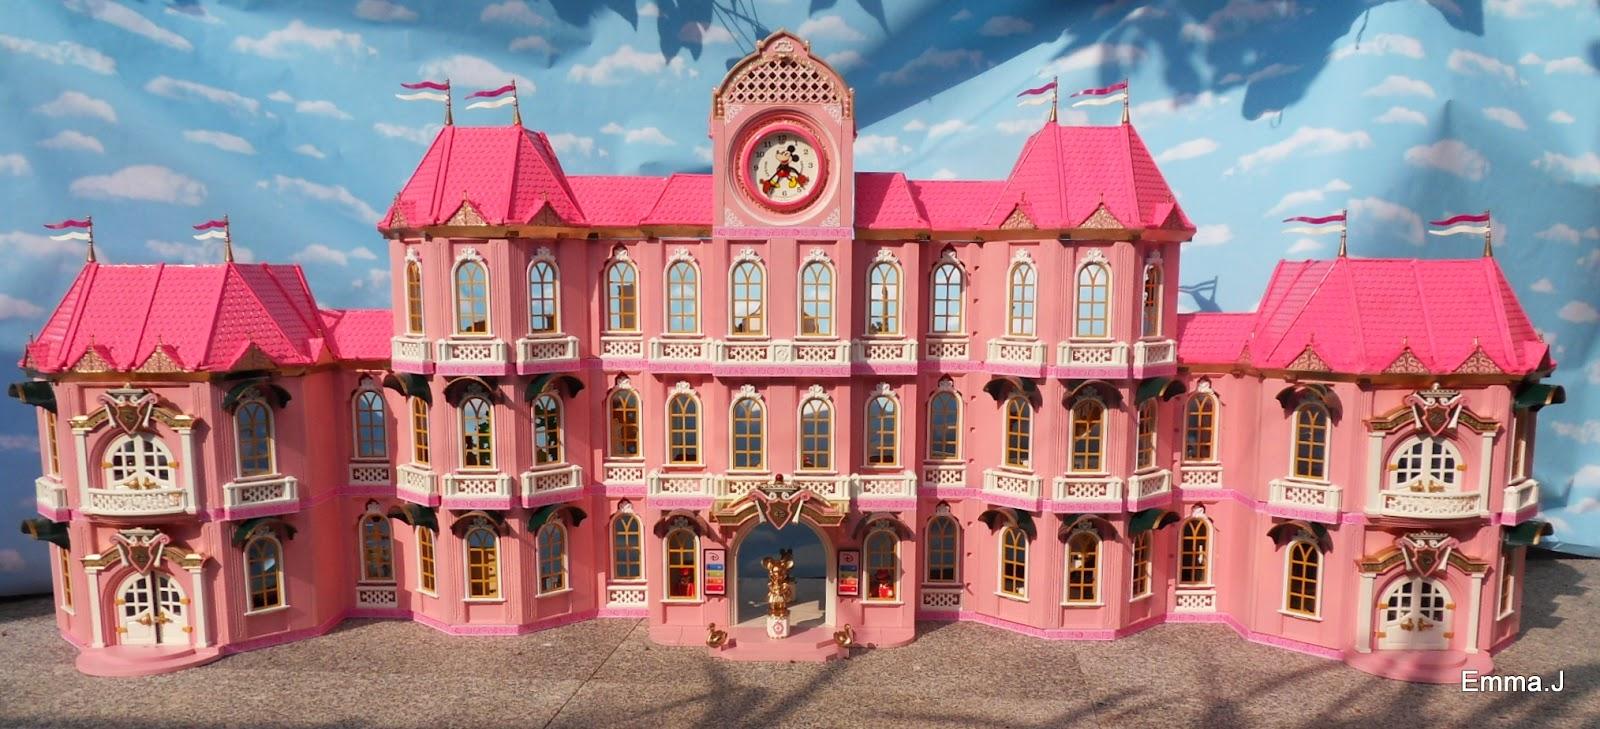 Disney Hotel Emma J S Playmobil